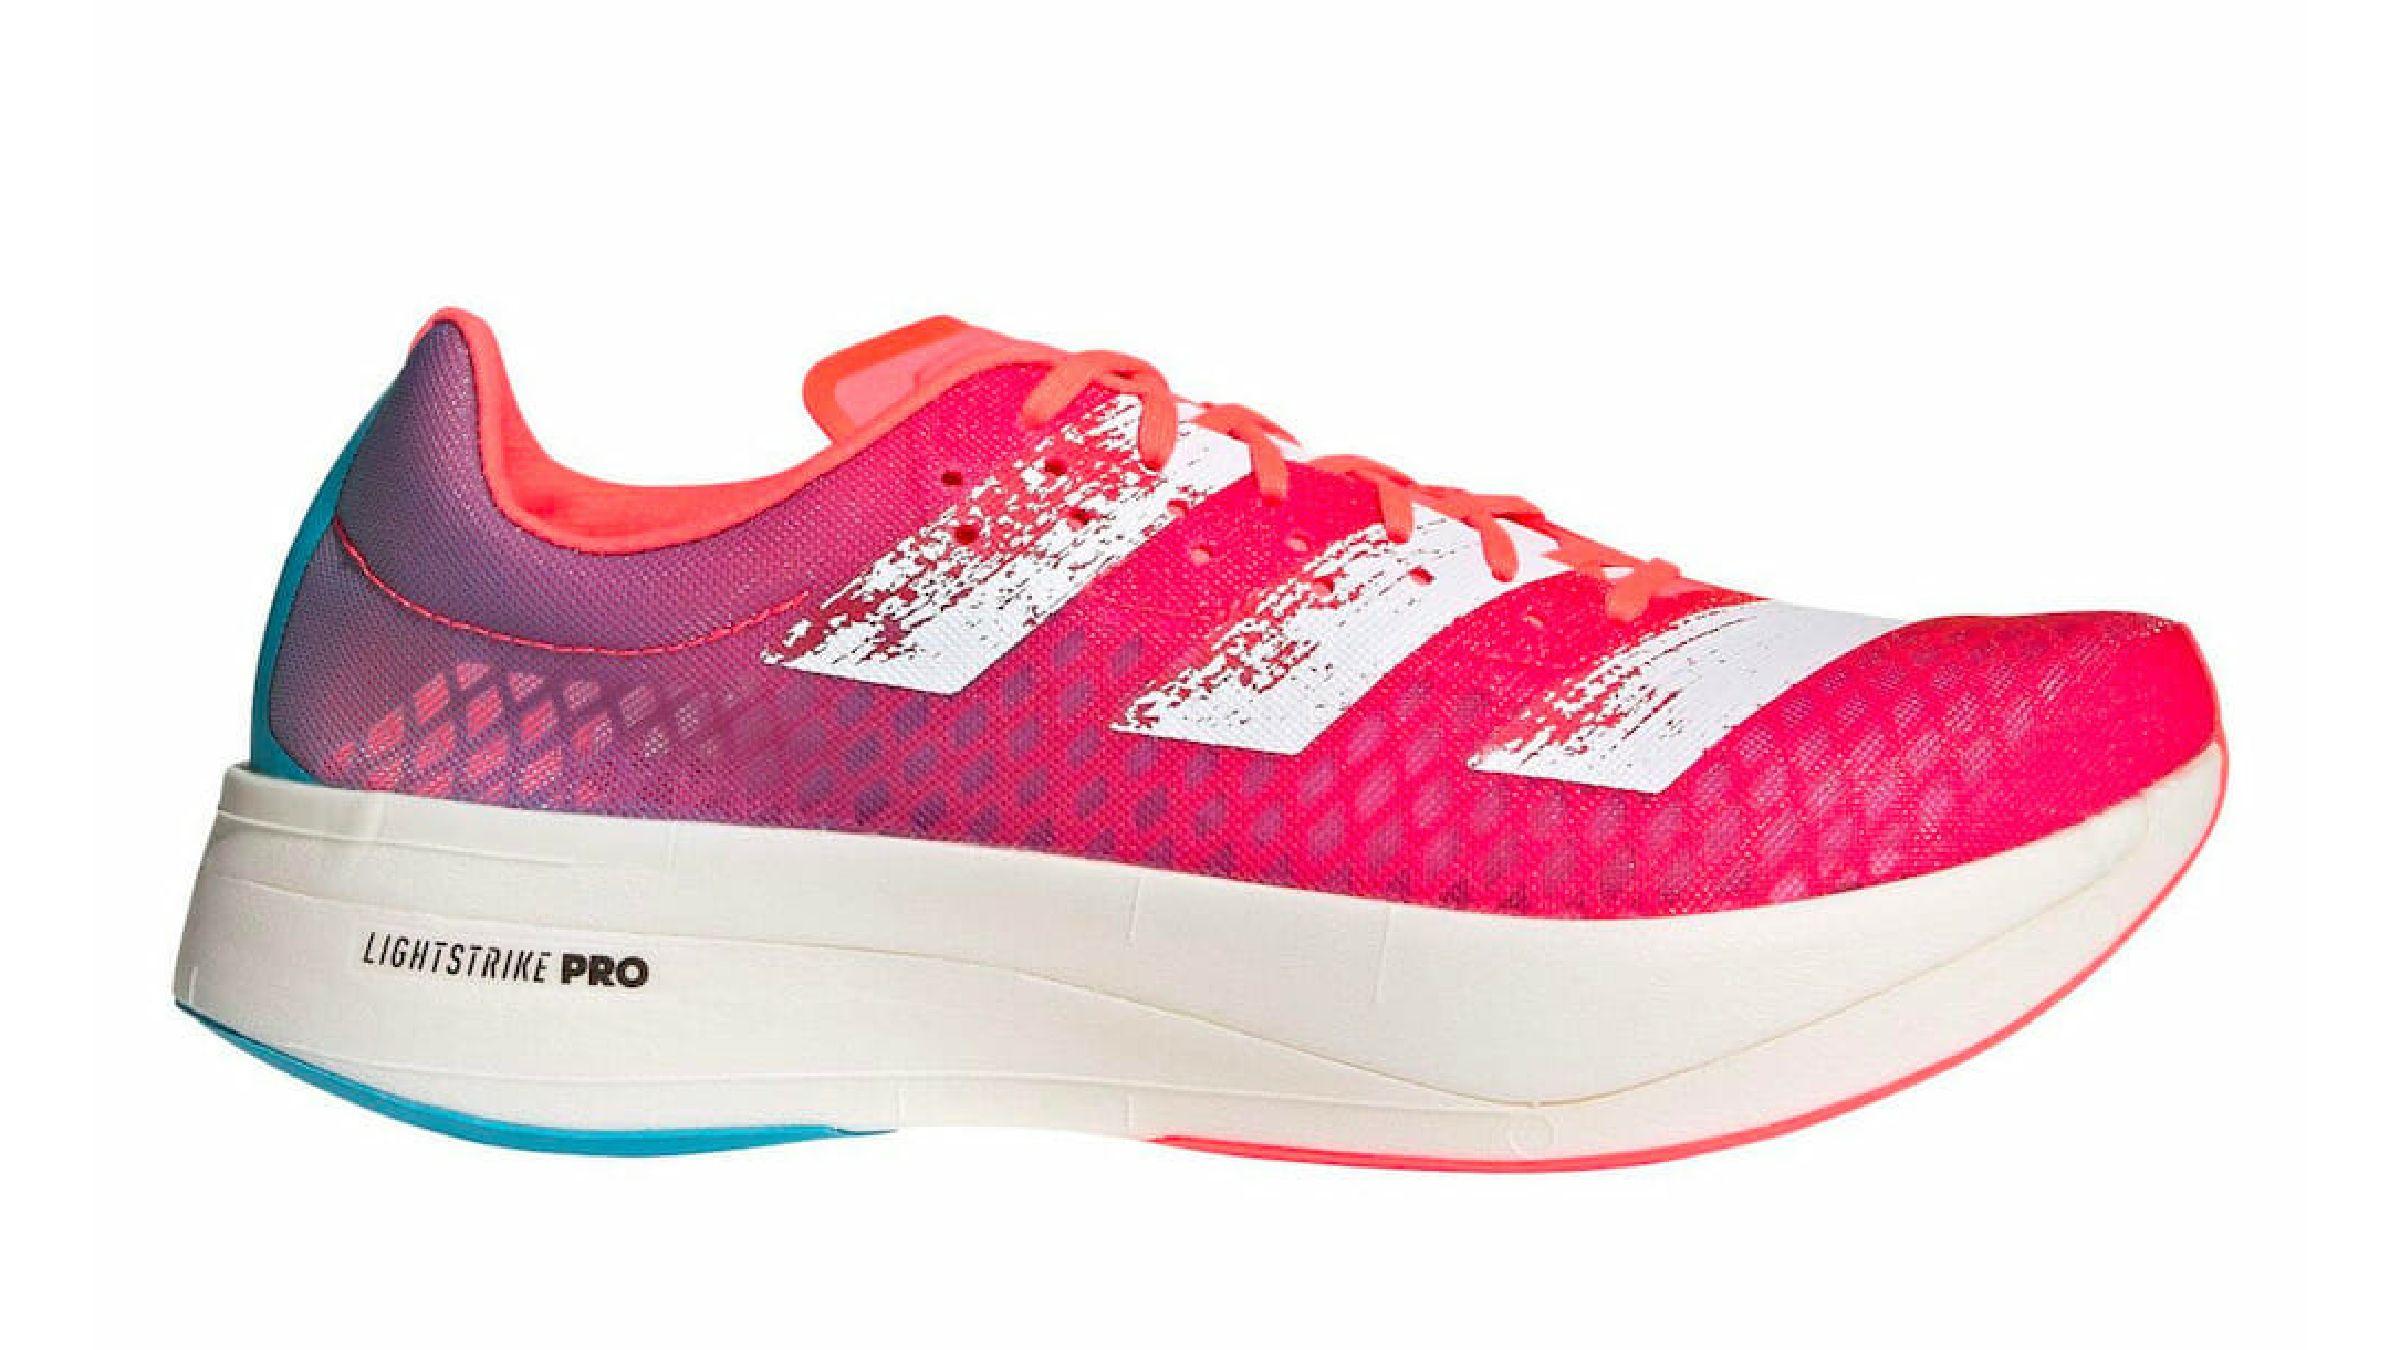 Neon pink Adidas Adizero Adios Pro running shoe